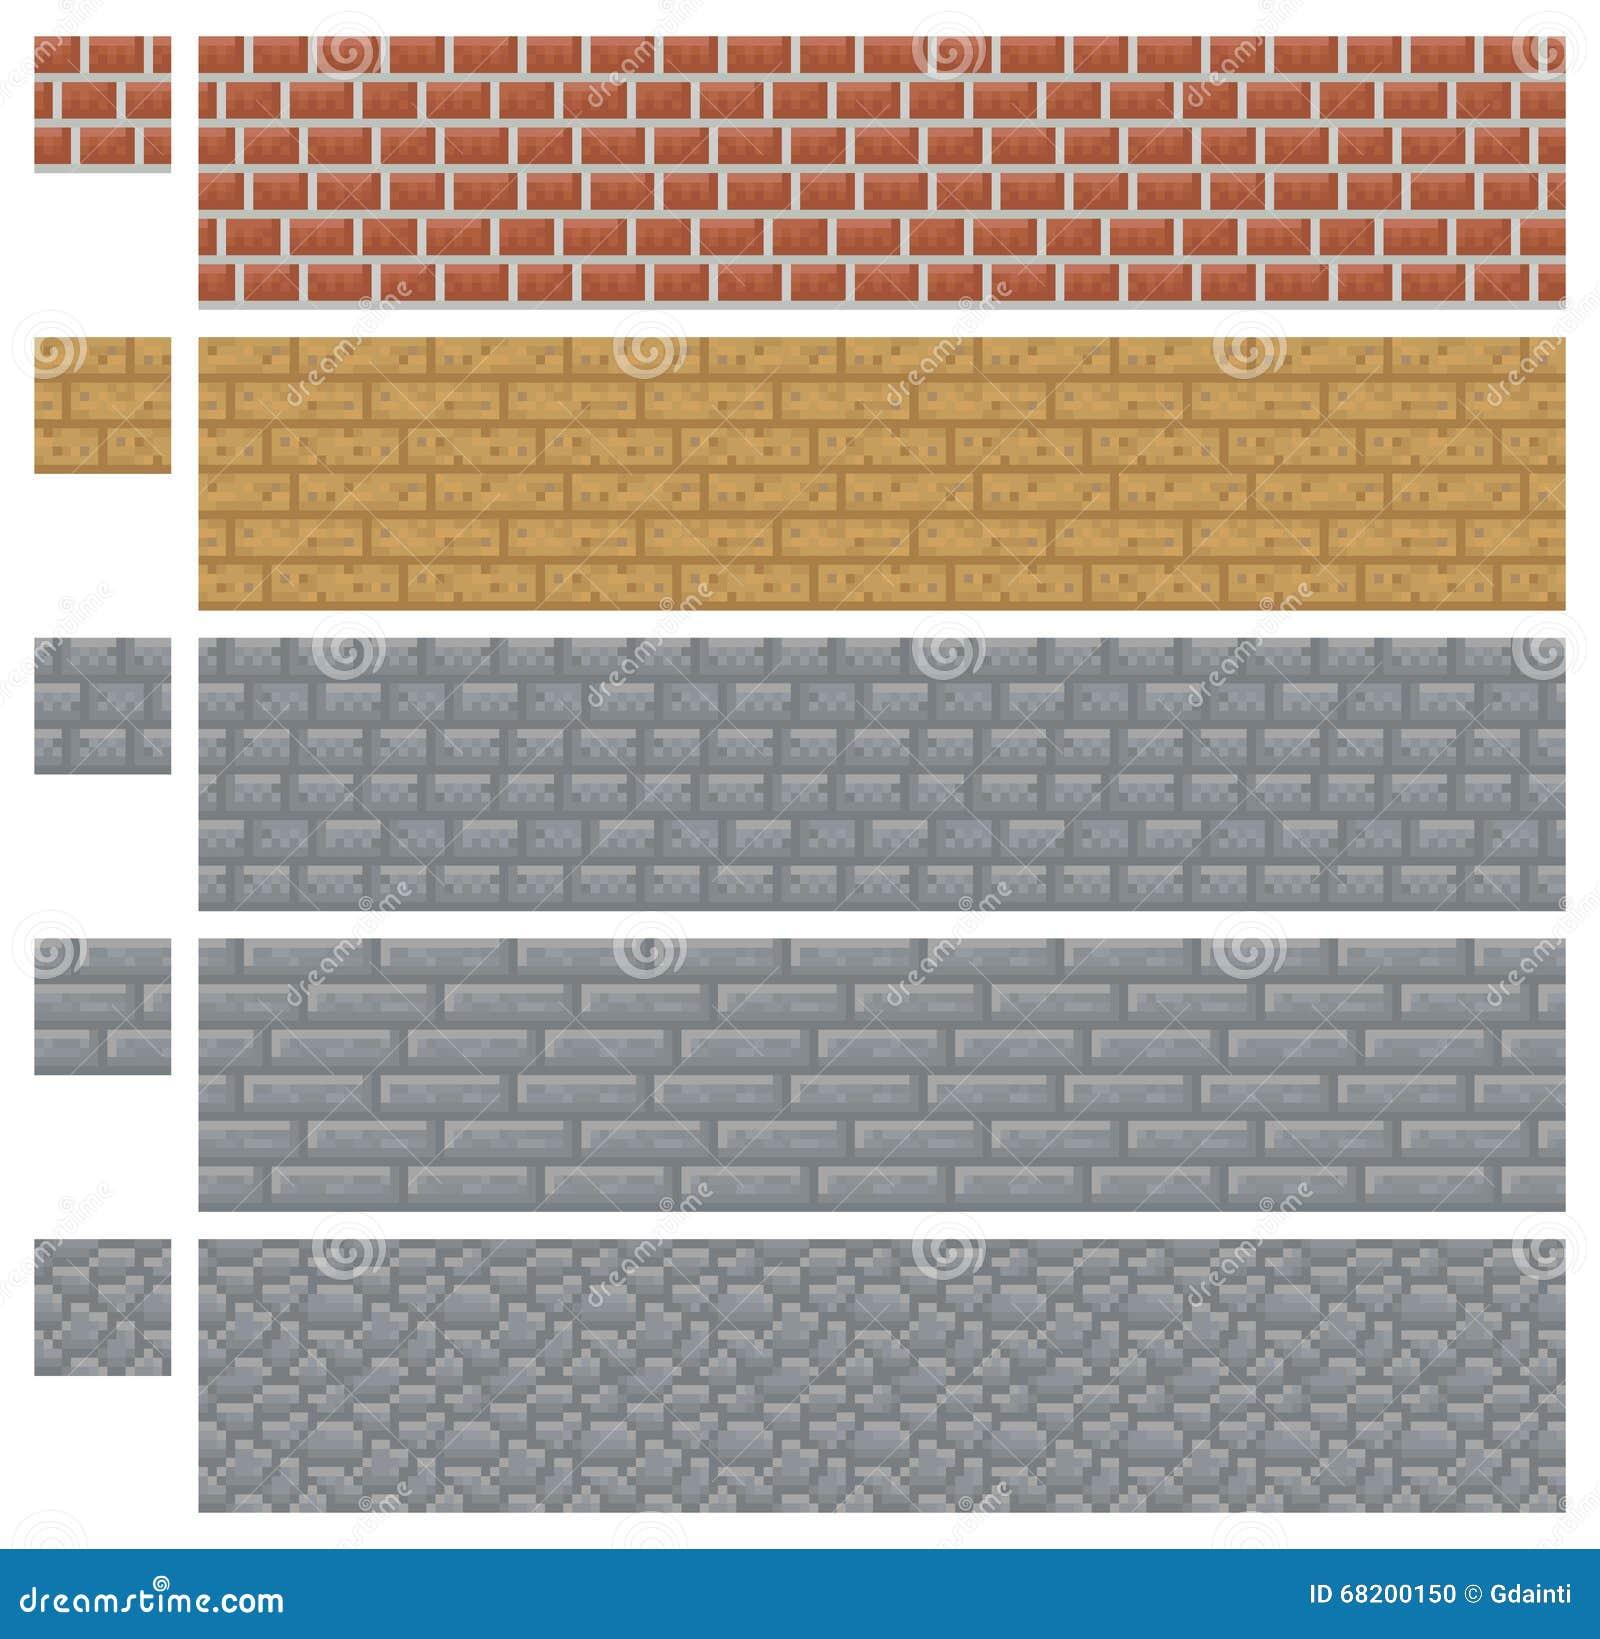 Stone Block Sprite : Texture for platformers pixel art vector brick stone